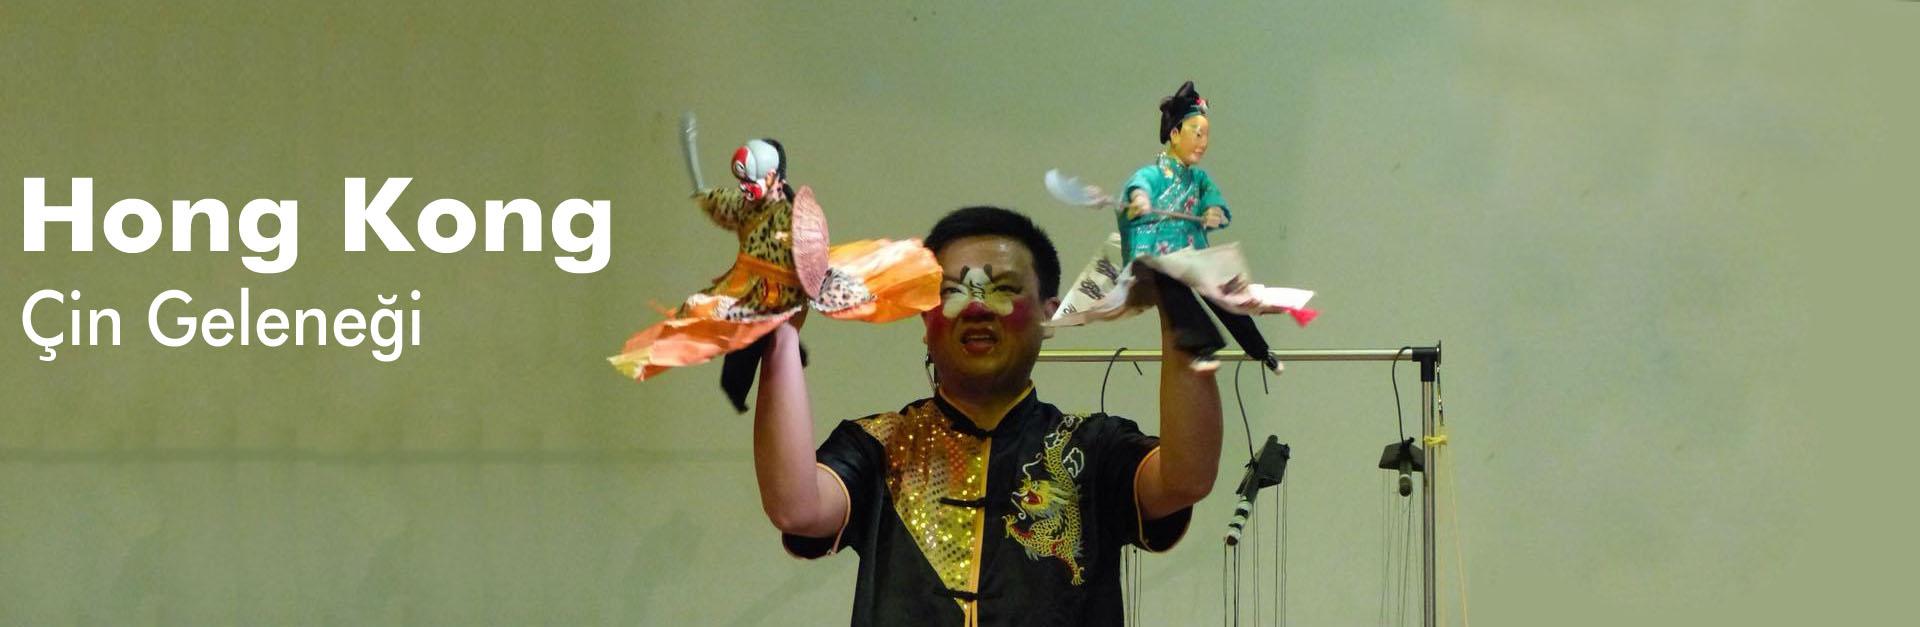 hongkong-tr